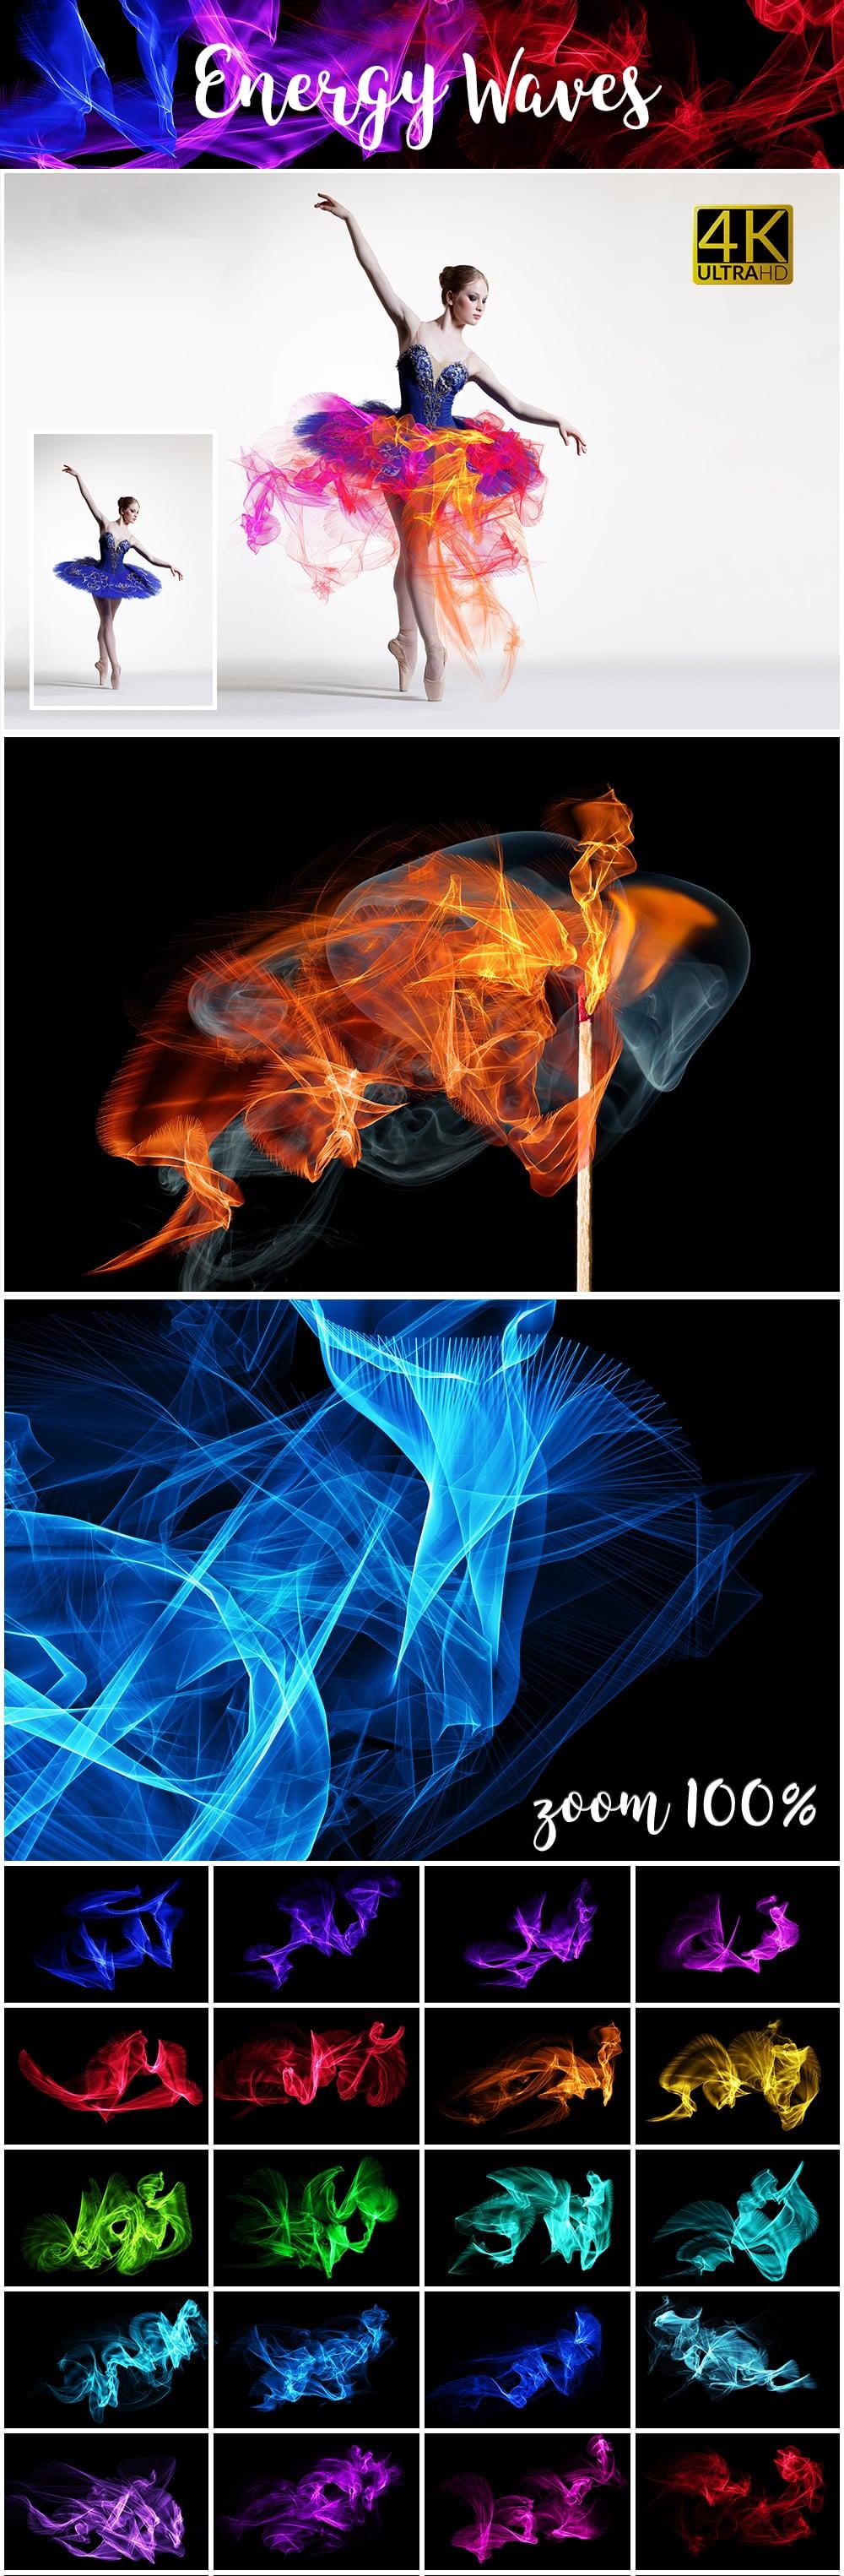 1100 Photoshop Overlays Mega Pack - Extended License - 23 Energy Waves